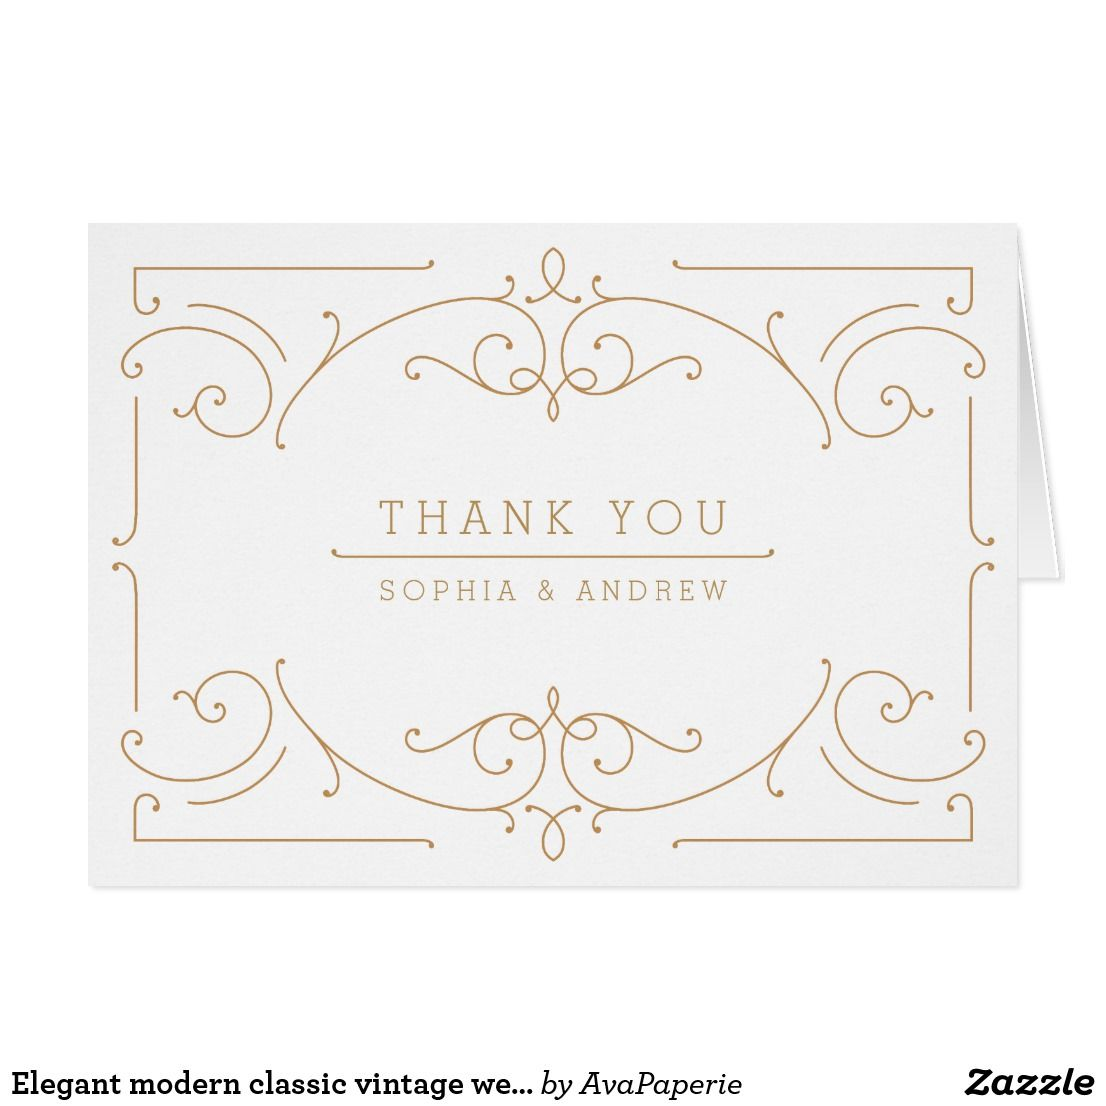 Elegant Modern Classic Vintage Wedding Thank You Zazzle Com Wedding Thank You Wedding Thank You Cards Vintage Wedding